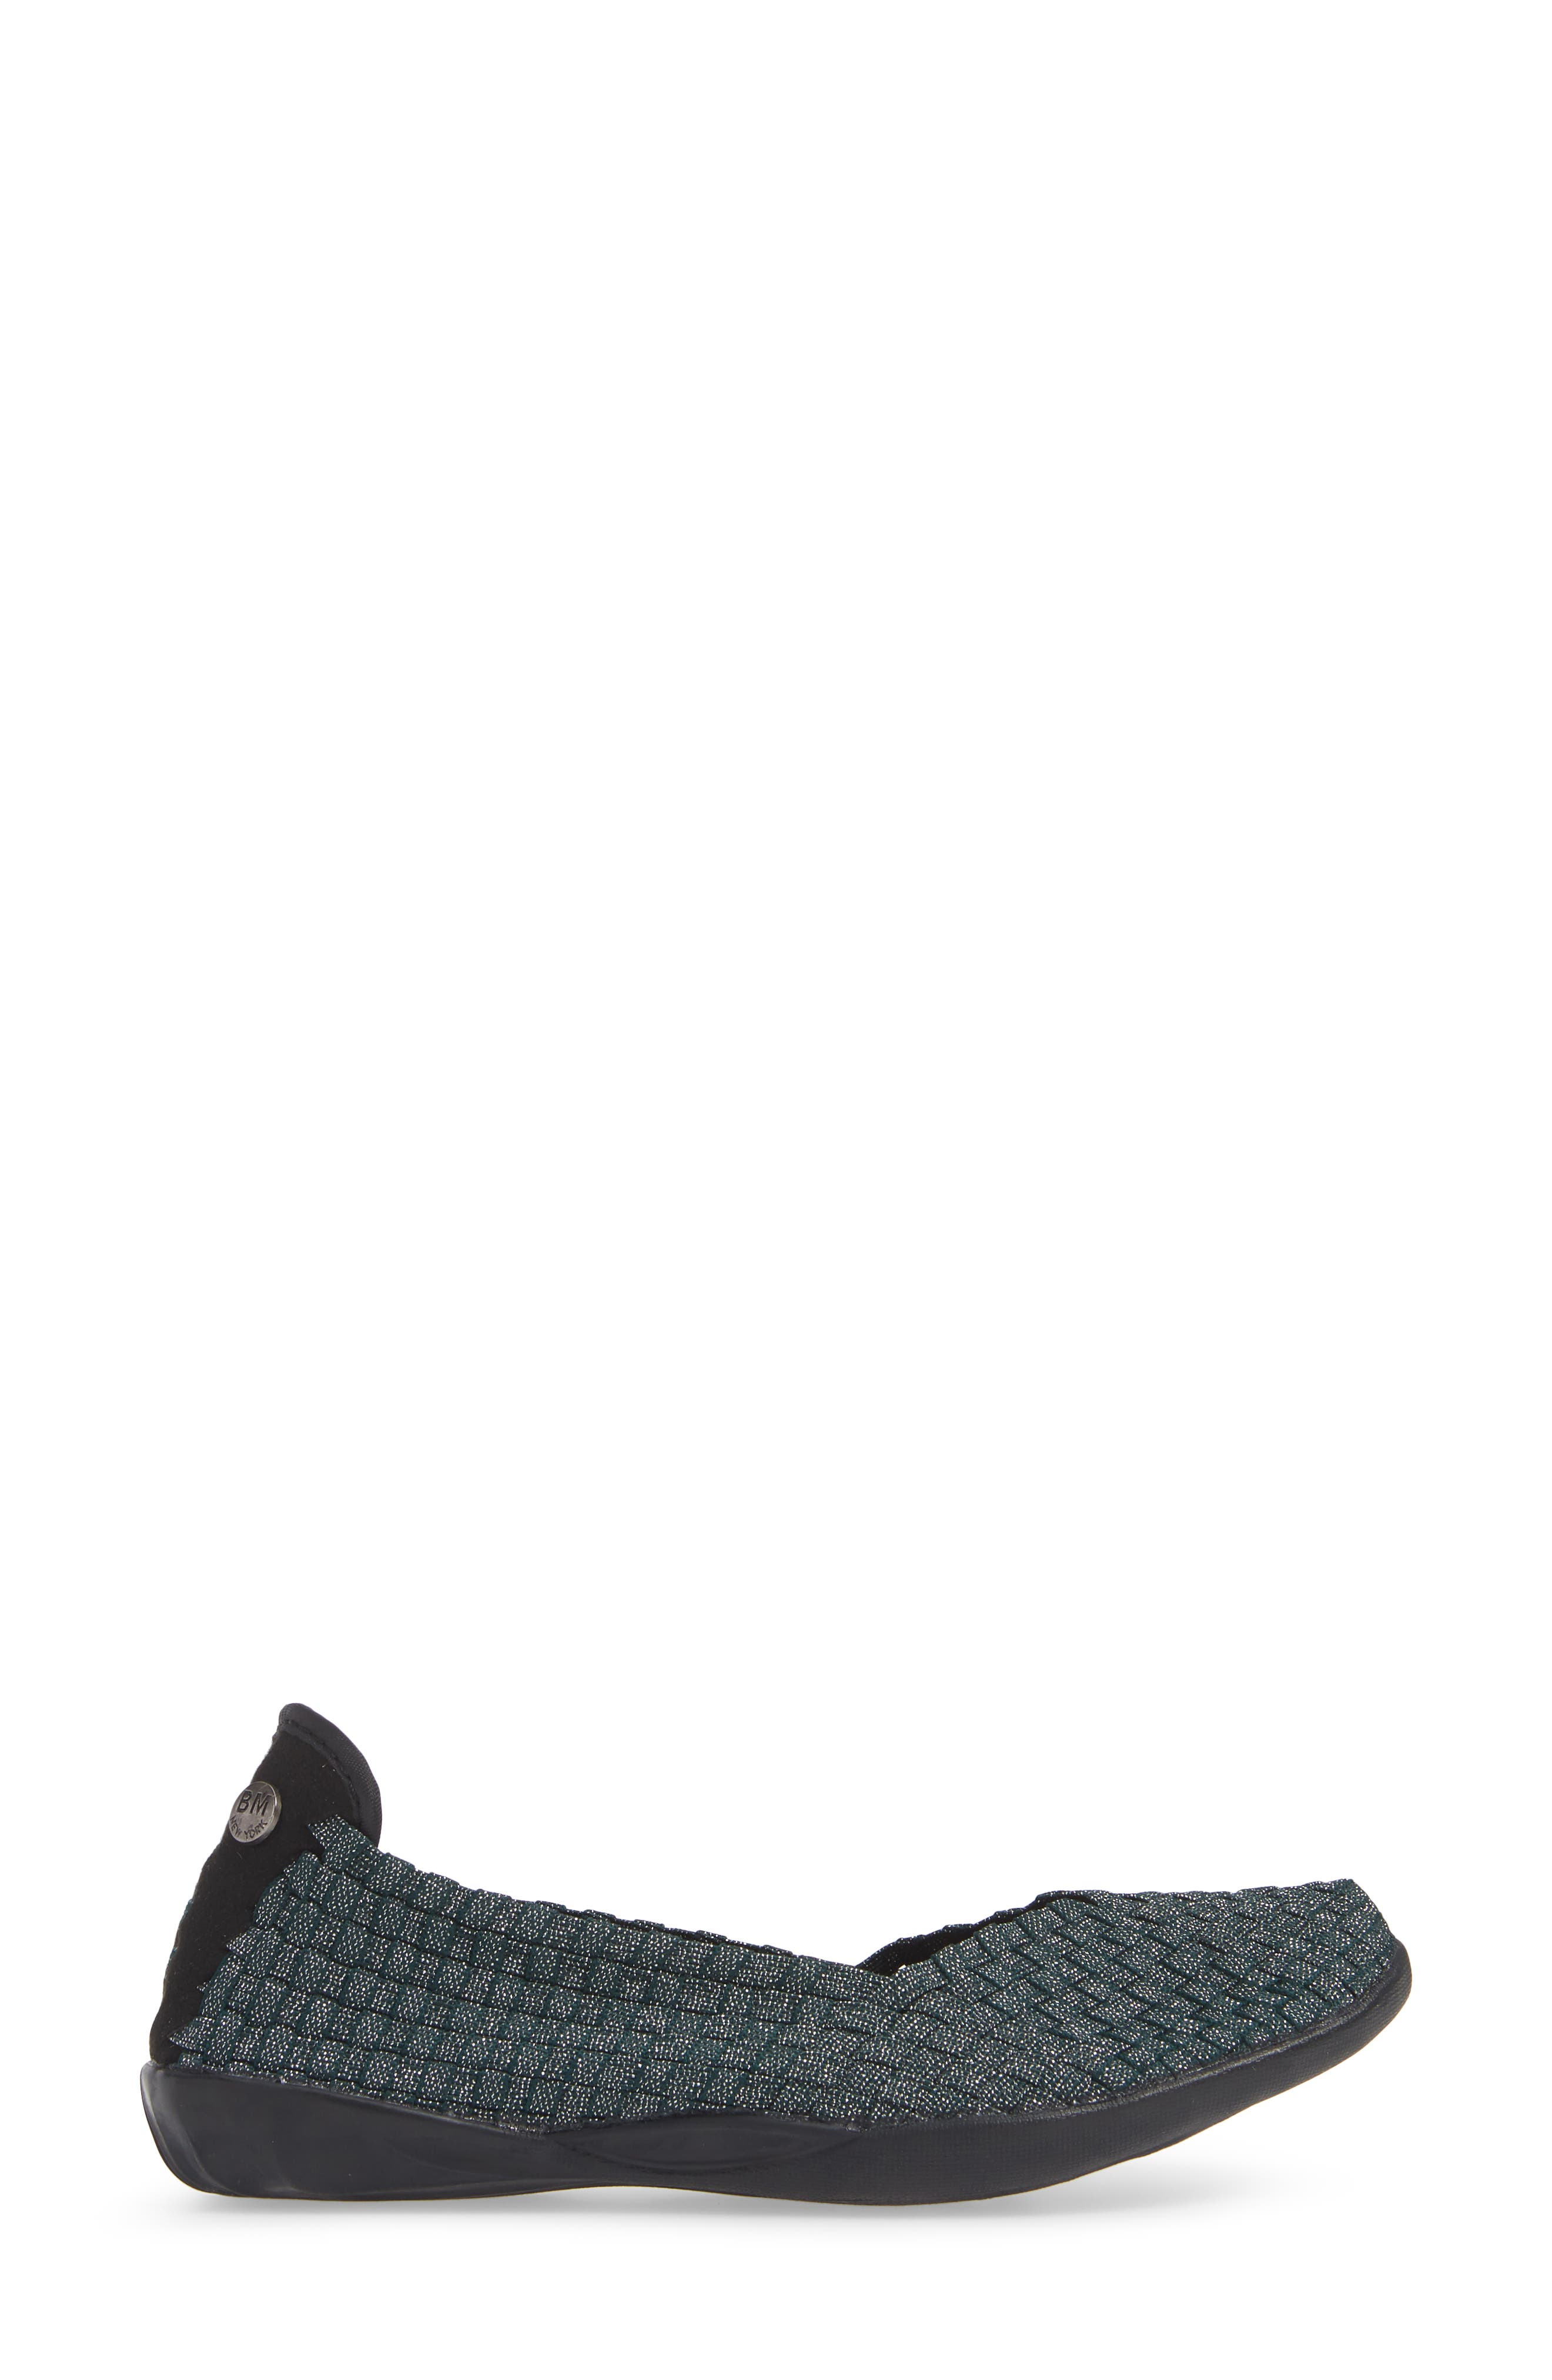 Catwalk Sneaker,                             Alternate thumbnail 3, color,                             DEEP GREEN SHIMMER FABRIC